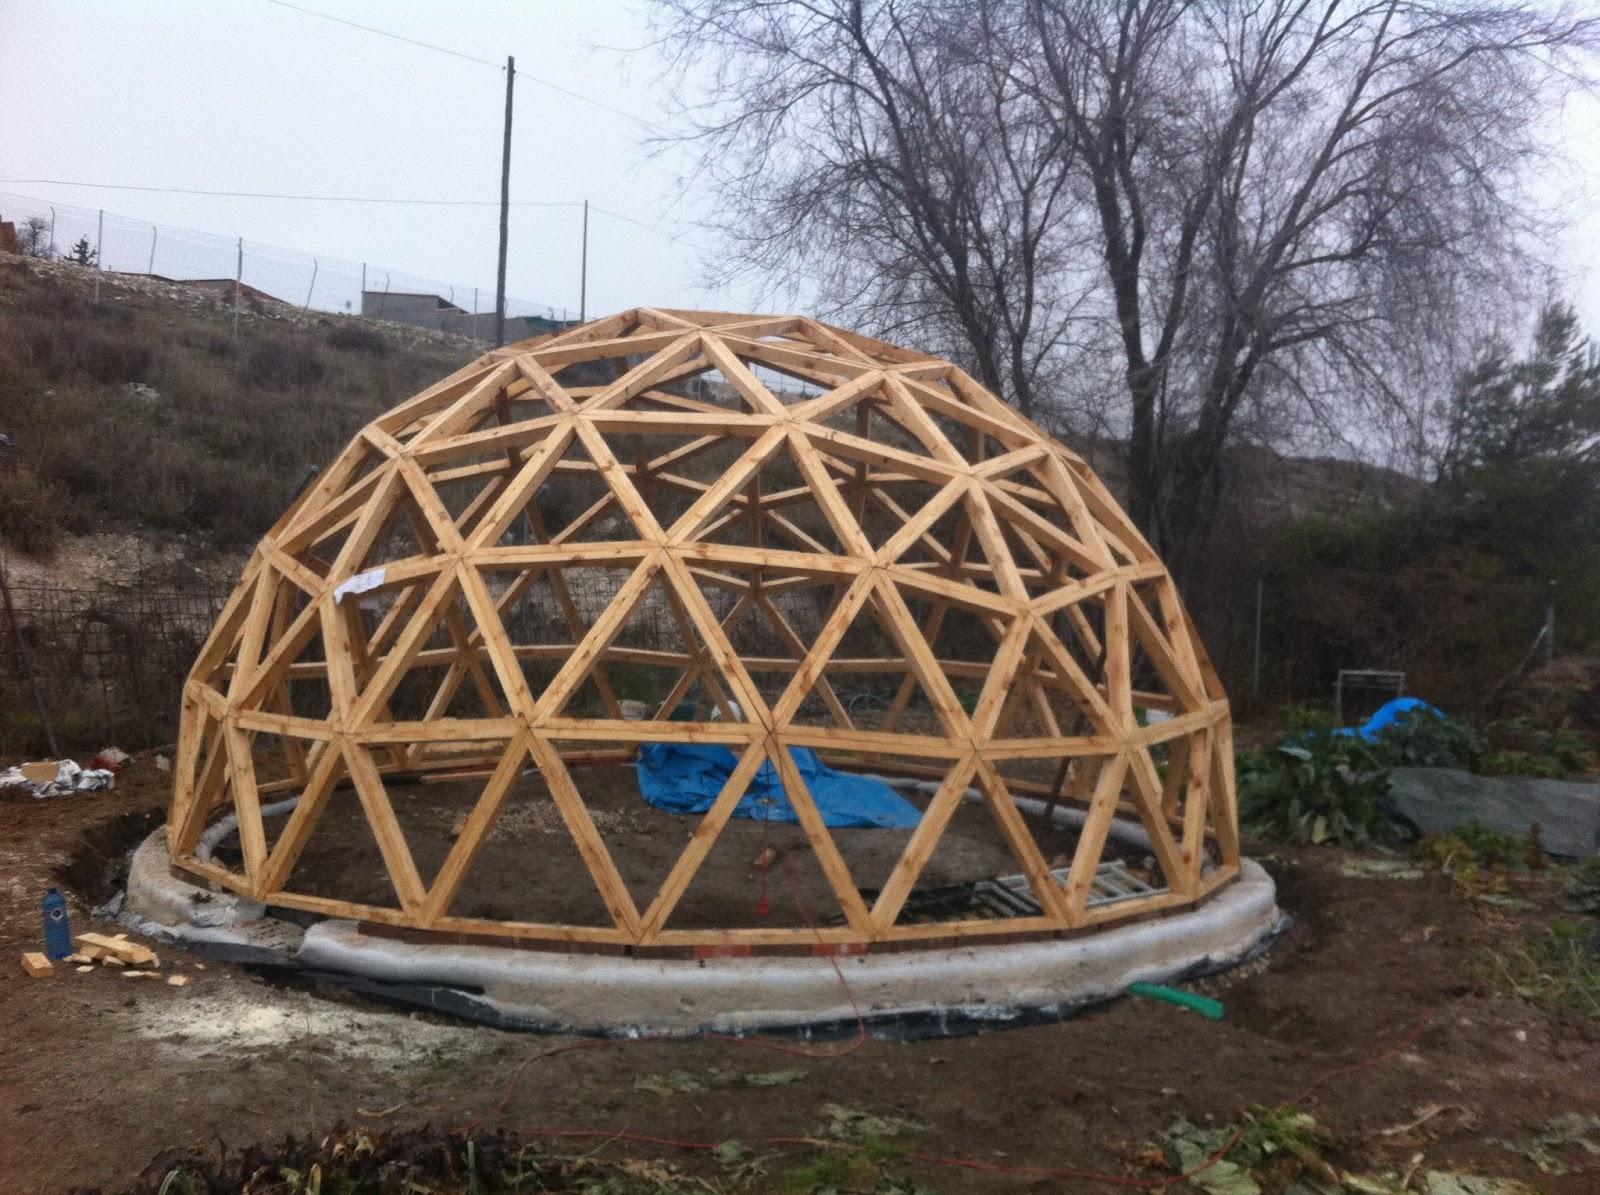 Domo Geod 233 Sico Forma Perfeita De Buckminster Fuller